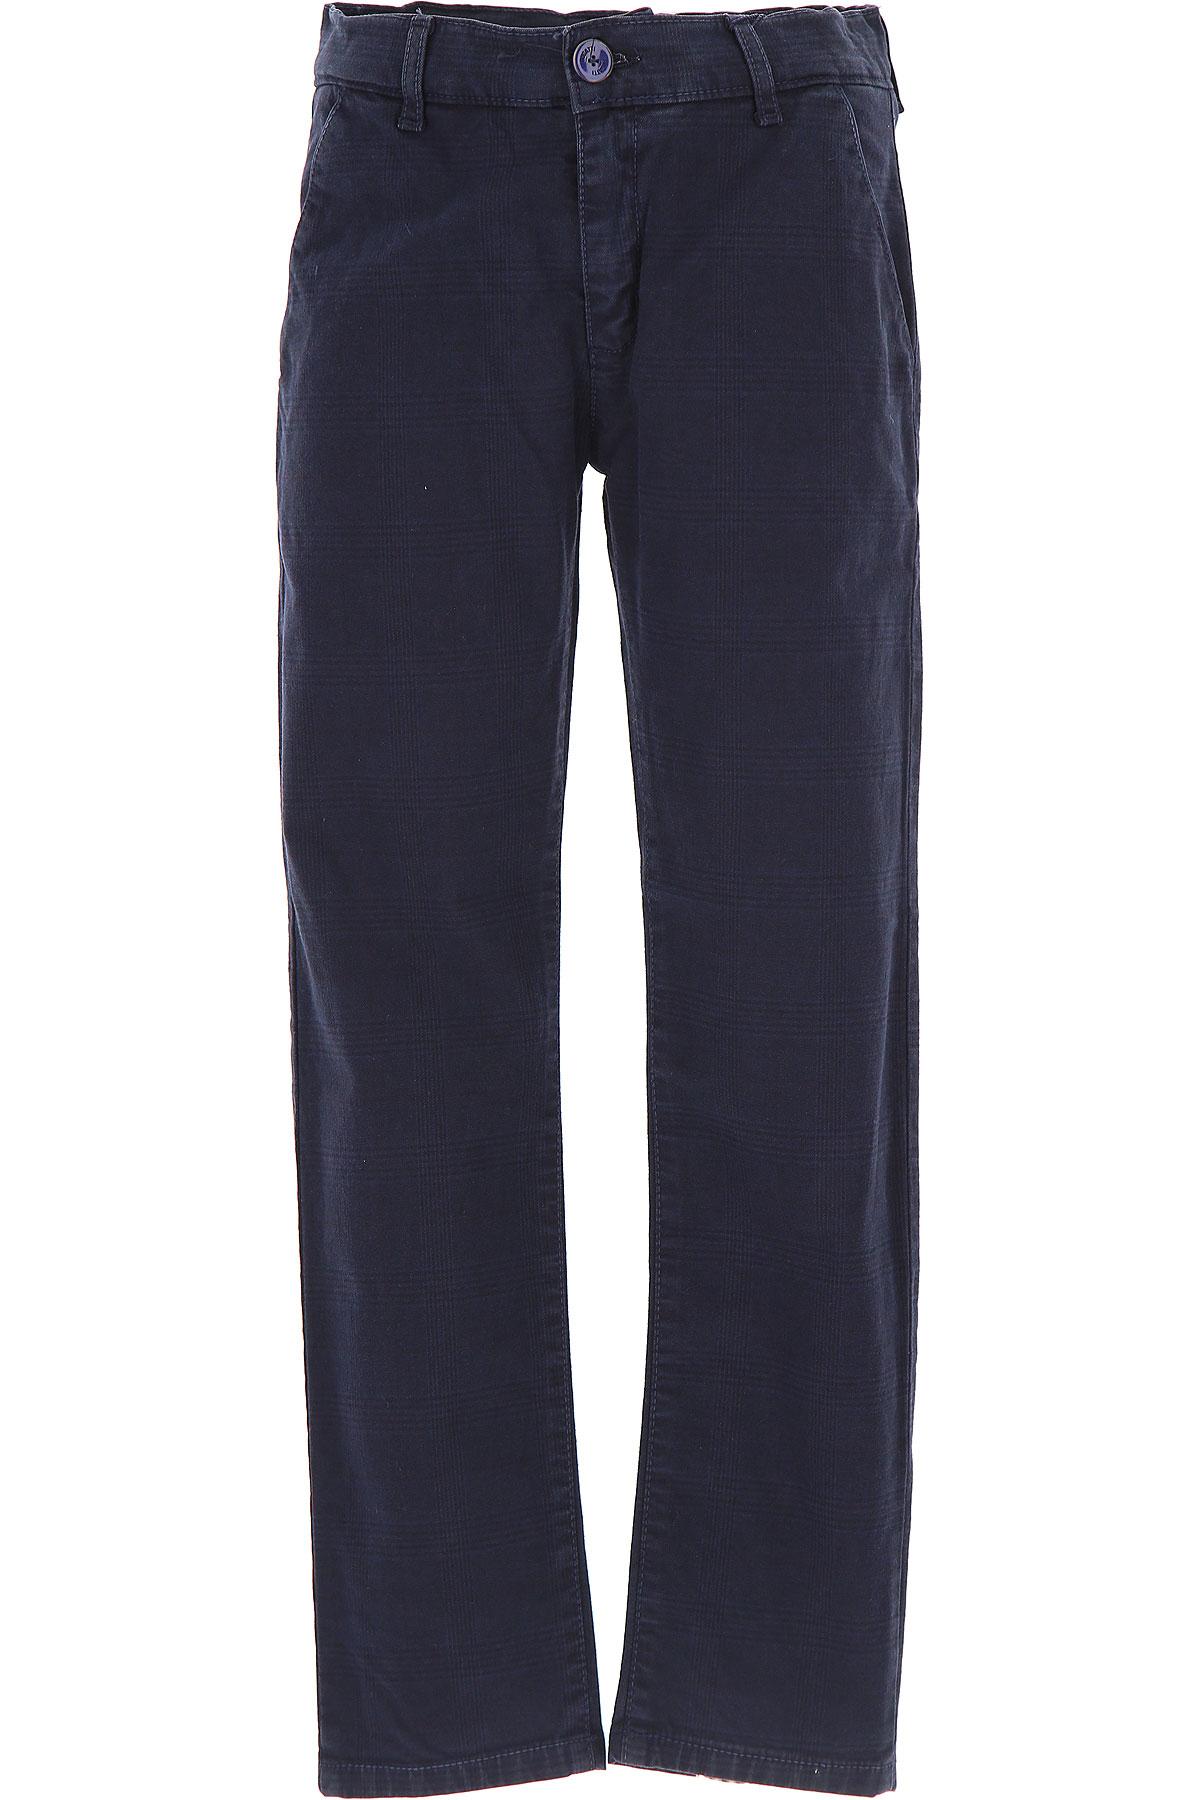 Image of Bugatti Kids Pants for Boys, Blue, Cotton, 2017, 10Y 14Y 16Y 8Y